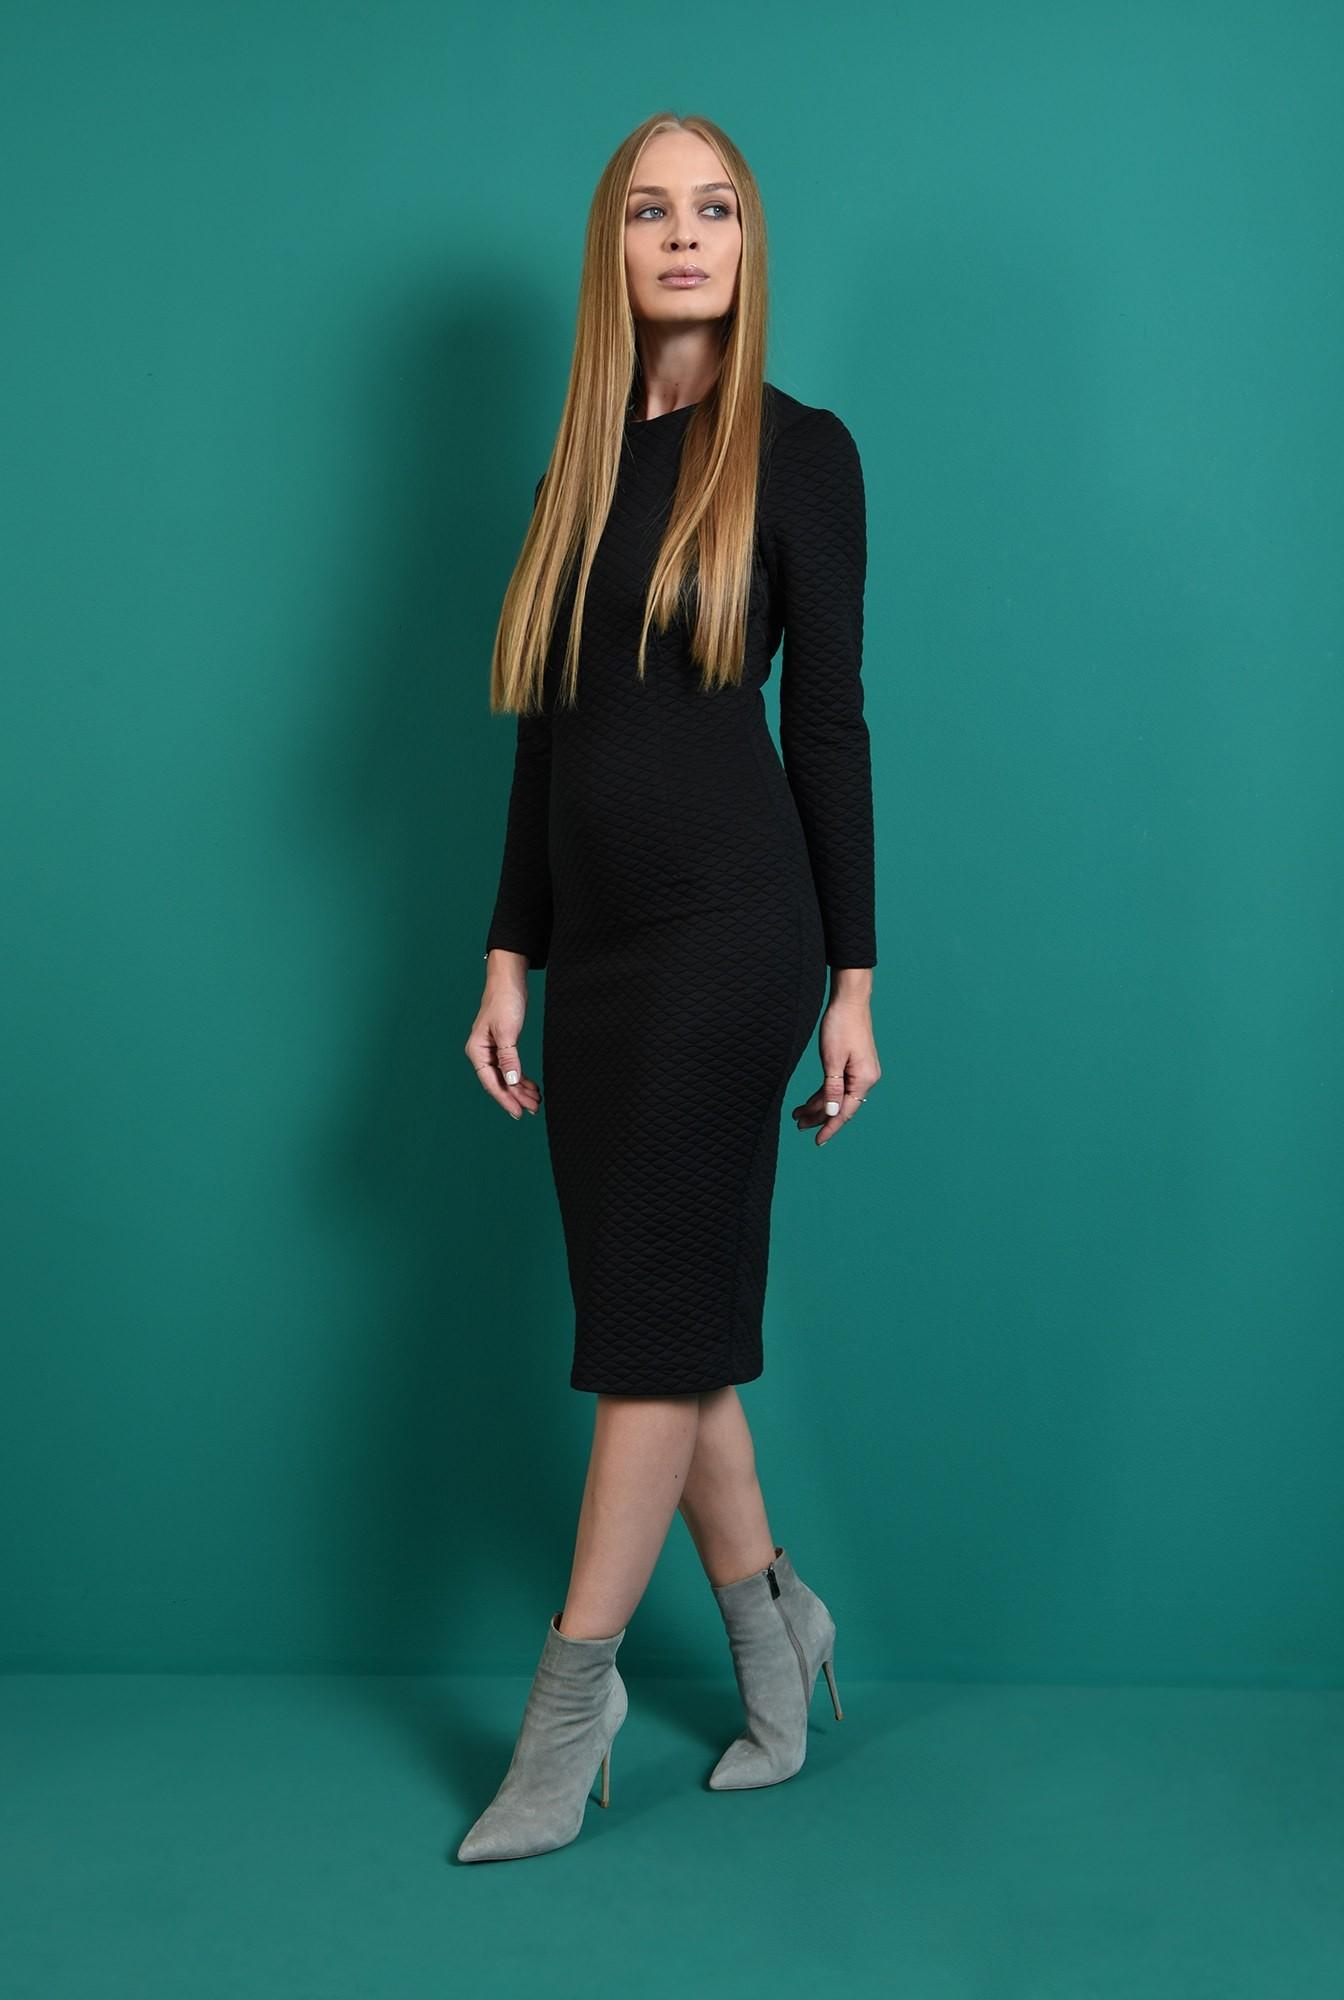 0 - rochie office, neagra, cu maneca lunga, Poema